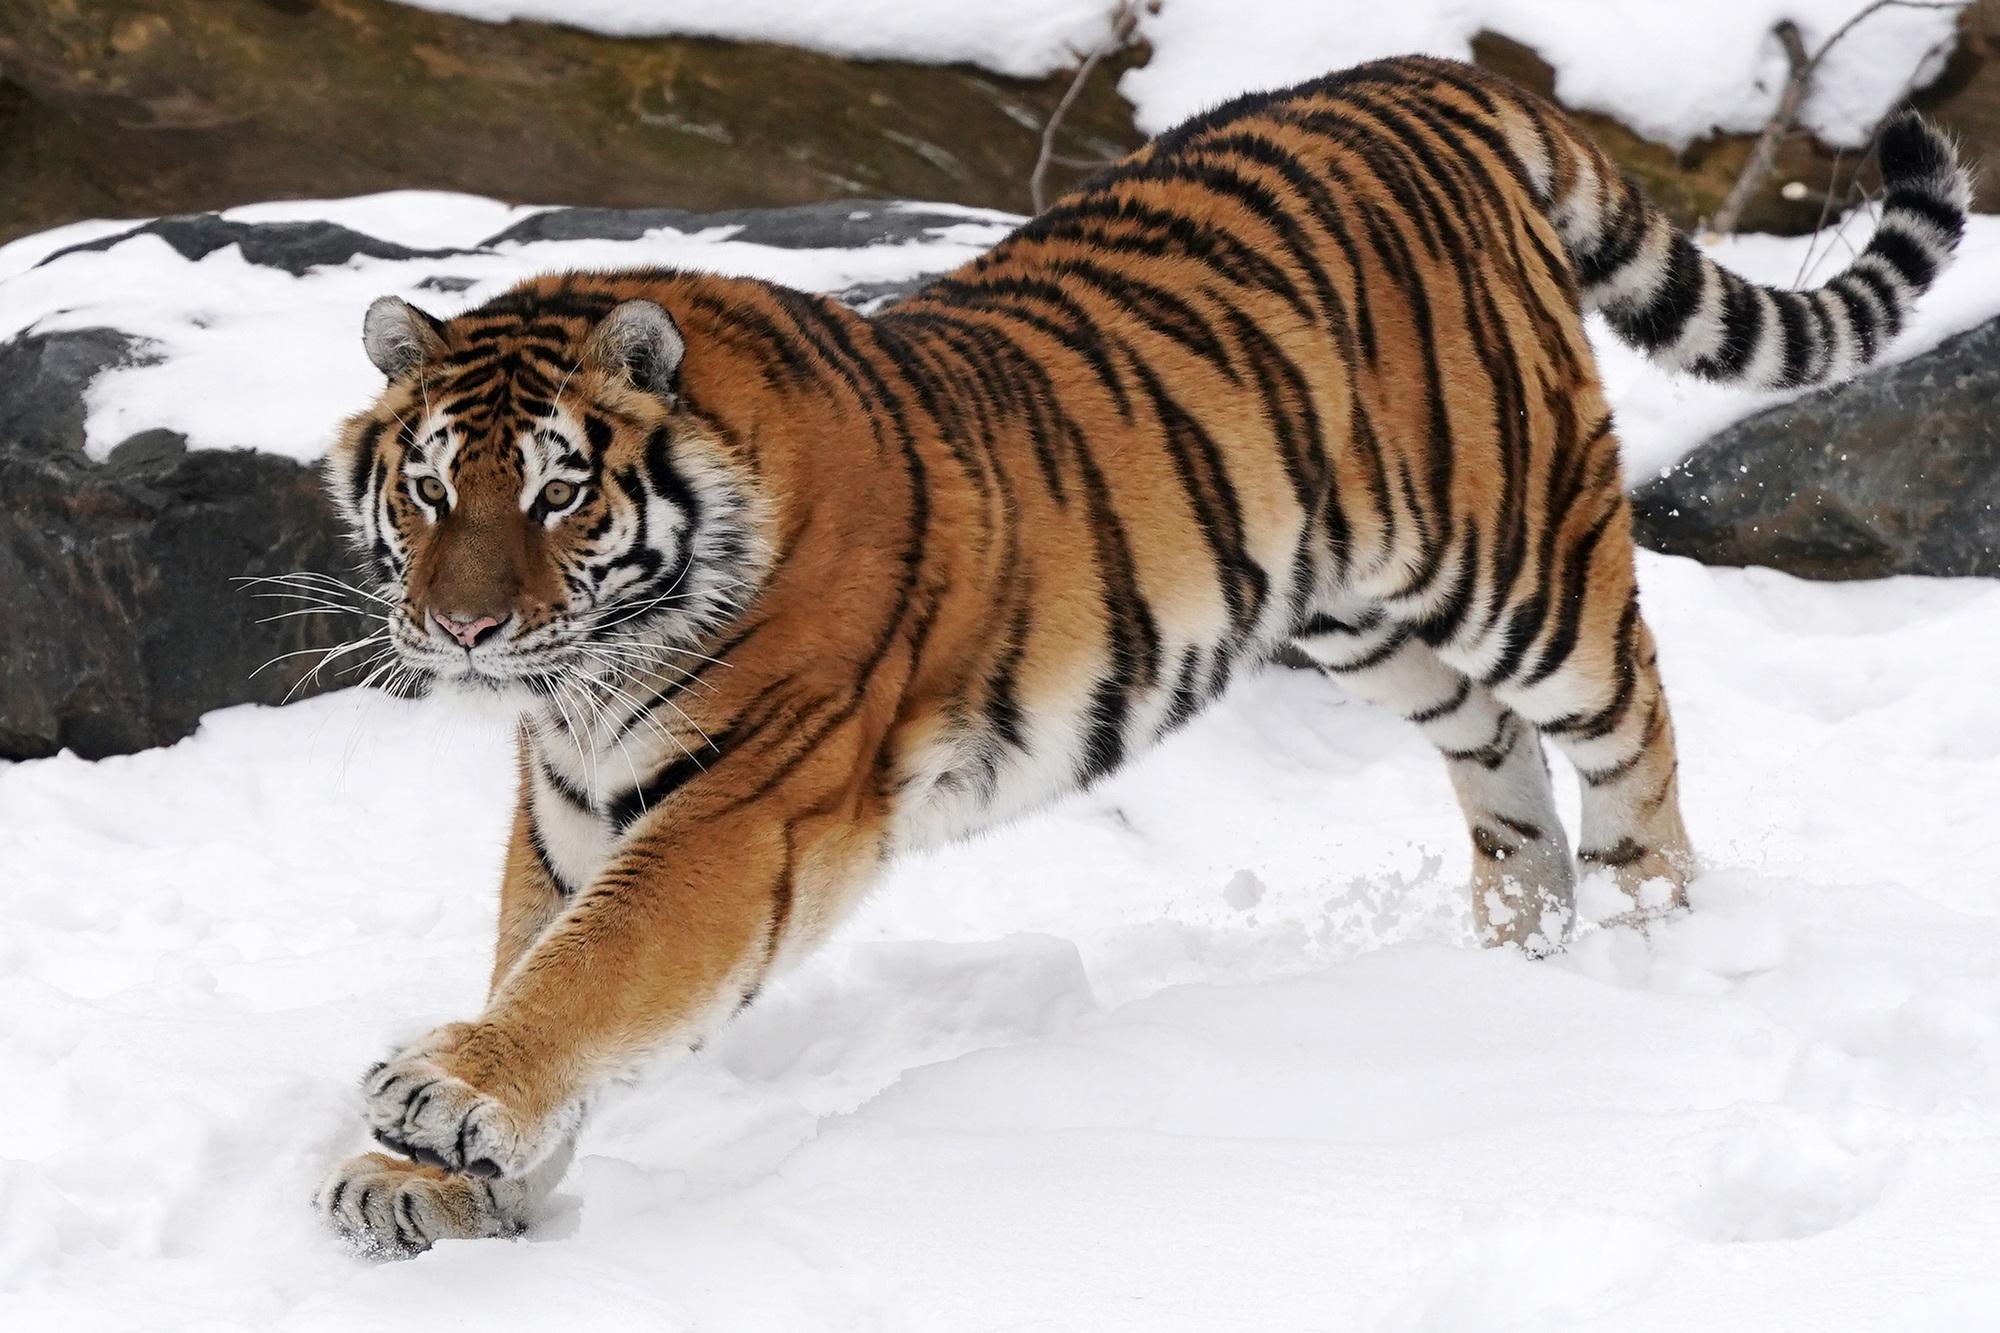 The Amur tiger ran around in the snow.